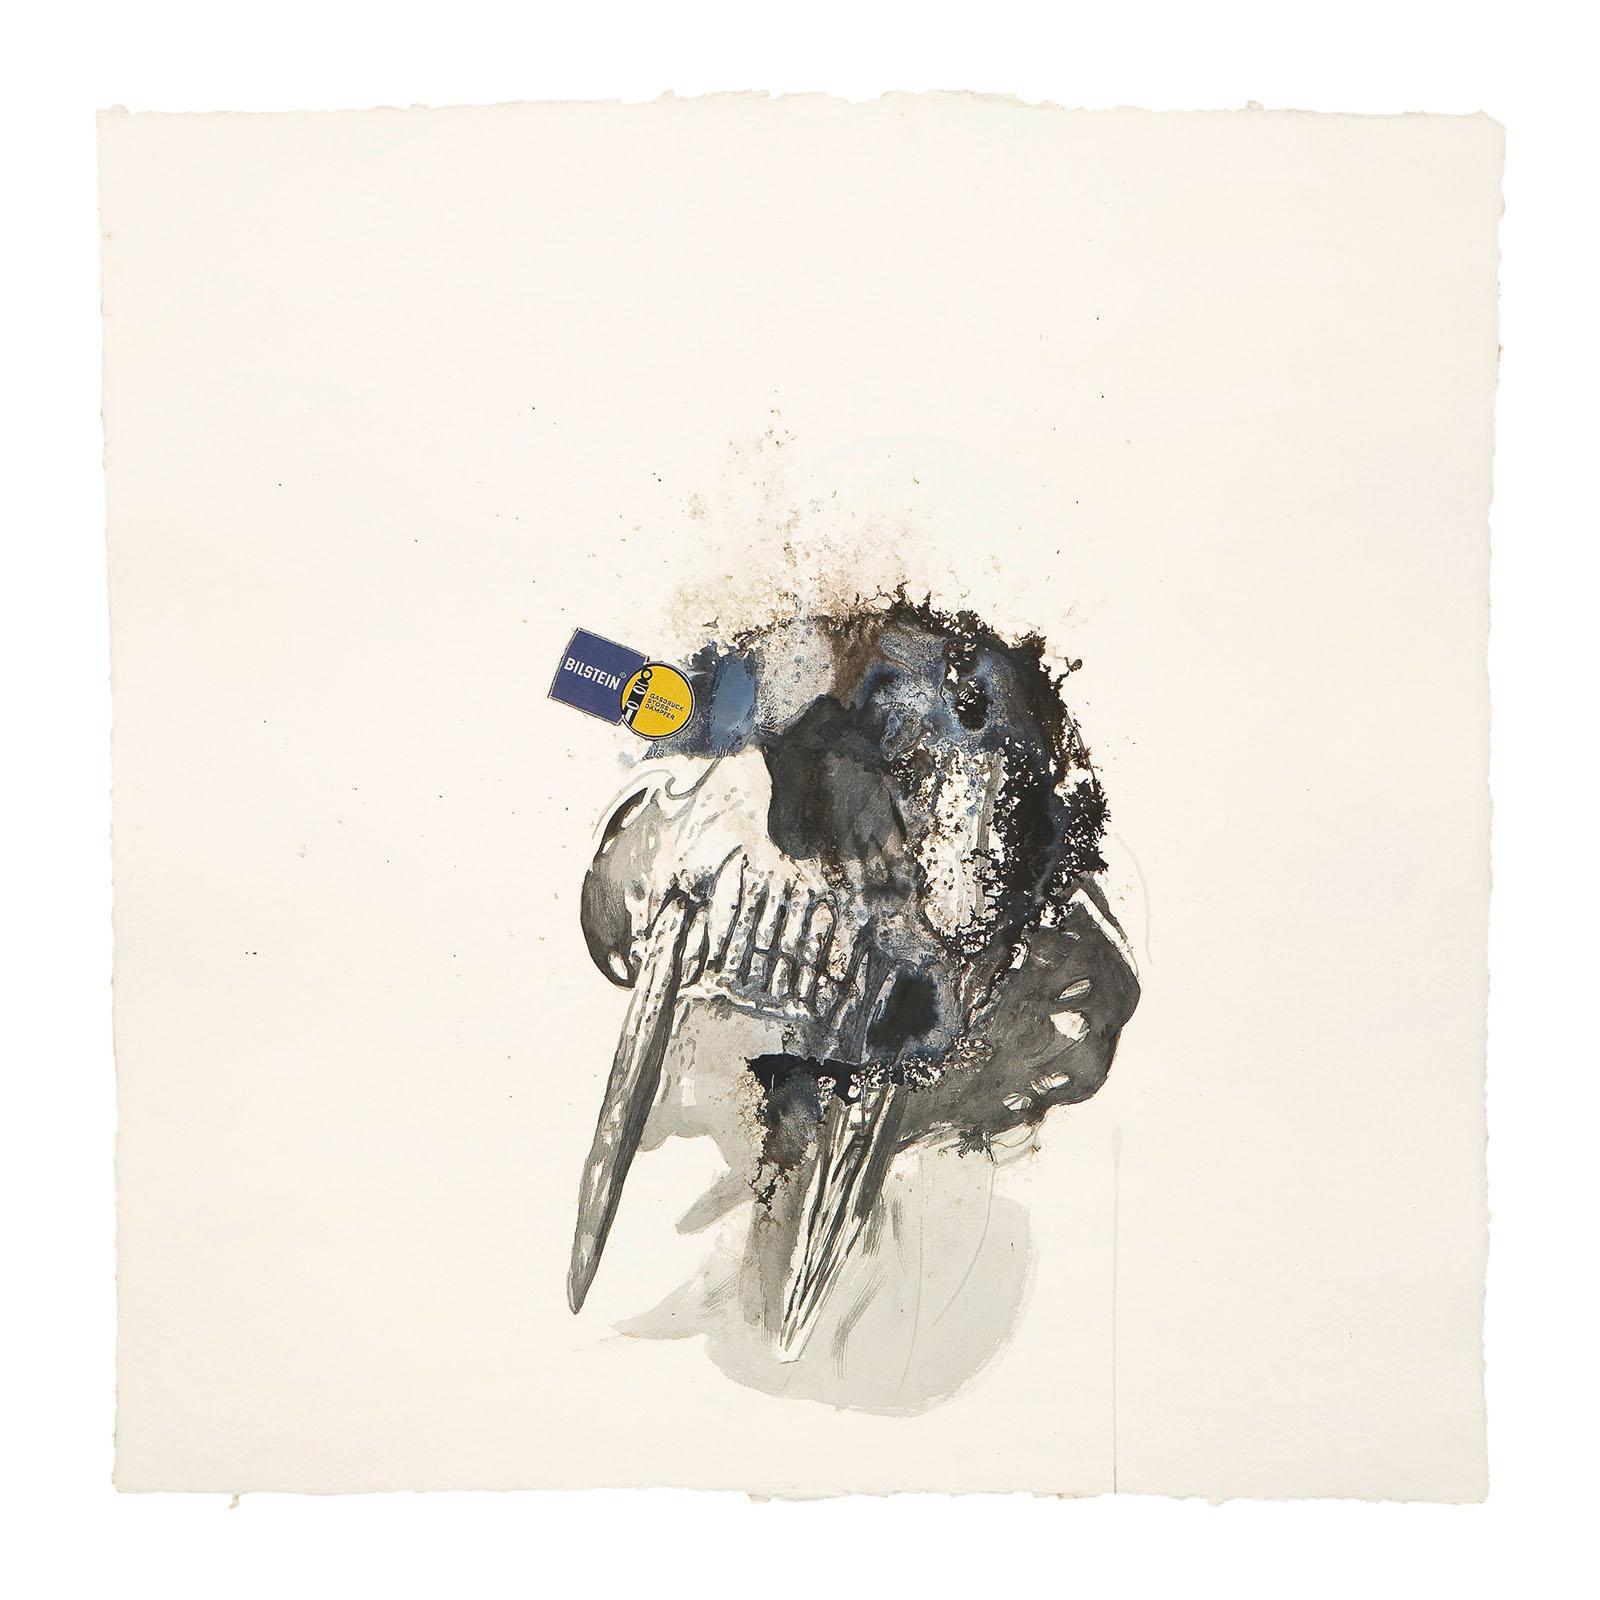 "o.T. aus ""Krähen Kommen -Titanweiß"", 2008, 105 x 105 cm, Aquarell, Tusche & Applikation auf handgeschöpftem Bütten"